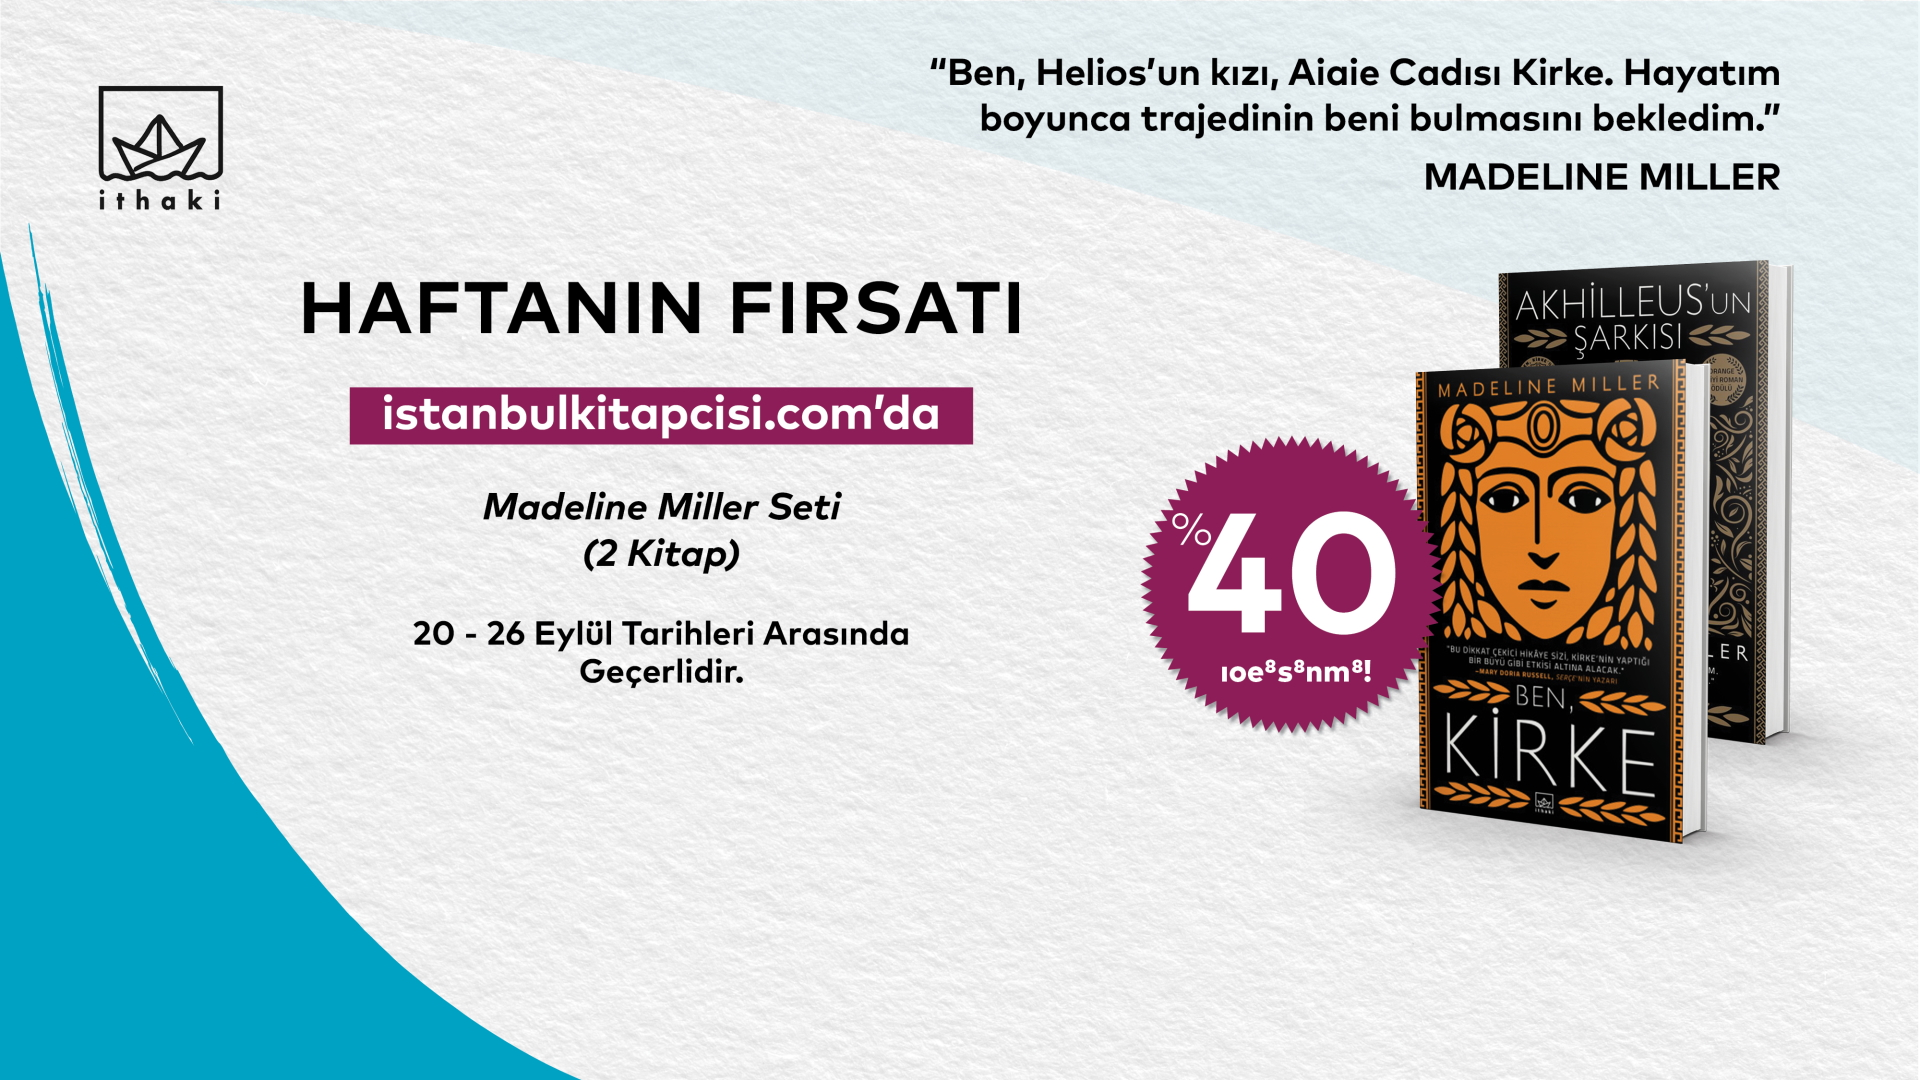 Madeline Miller seti, www.istanbulkitapcisi.com'da %40 indirimde!